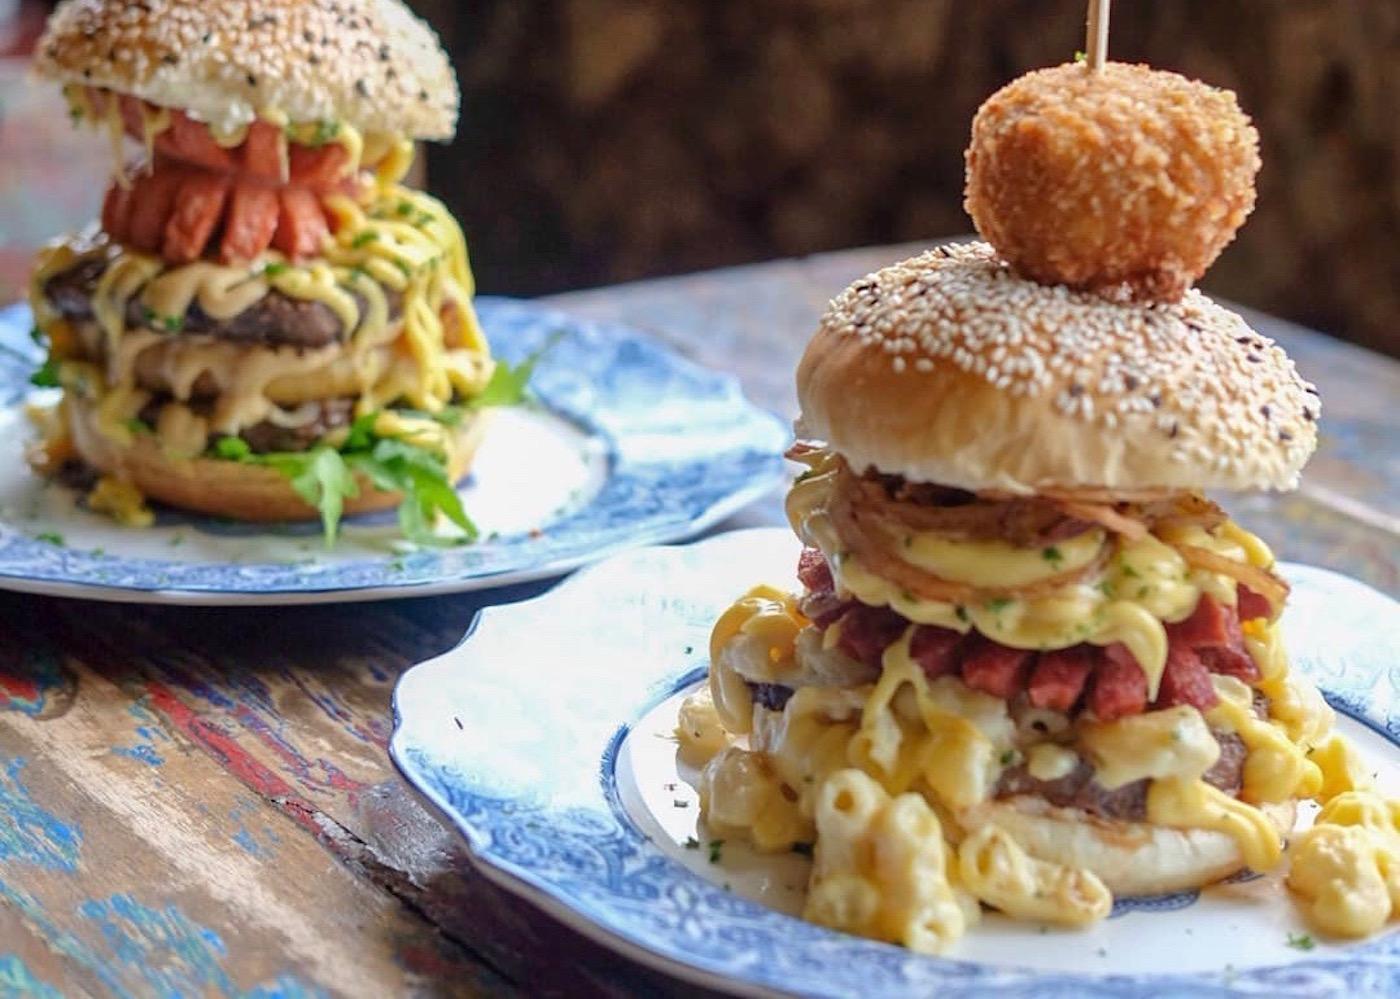 Burgers in Indonesia